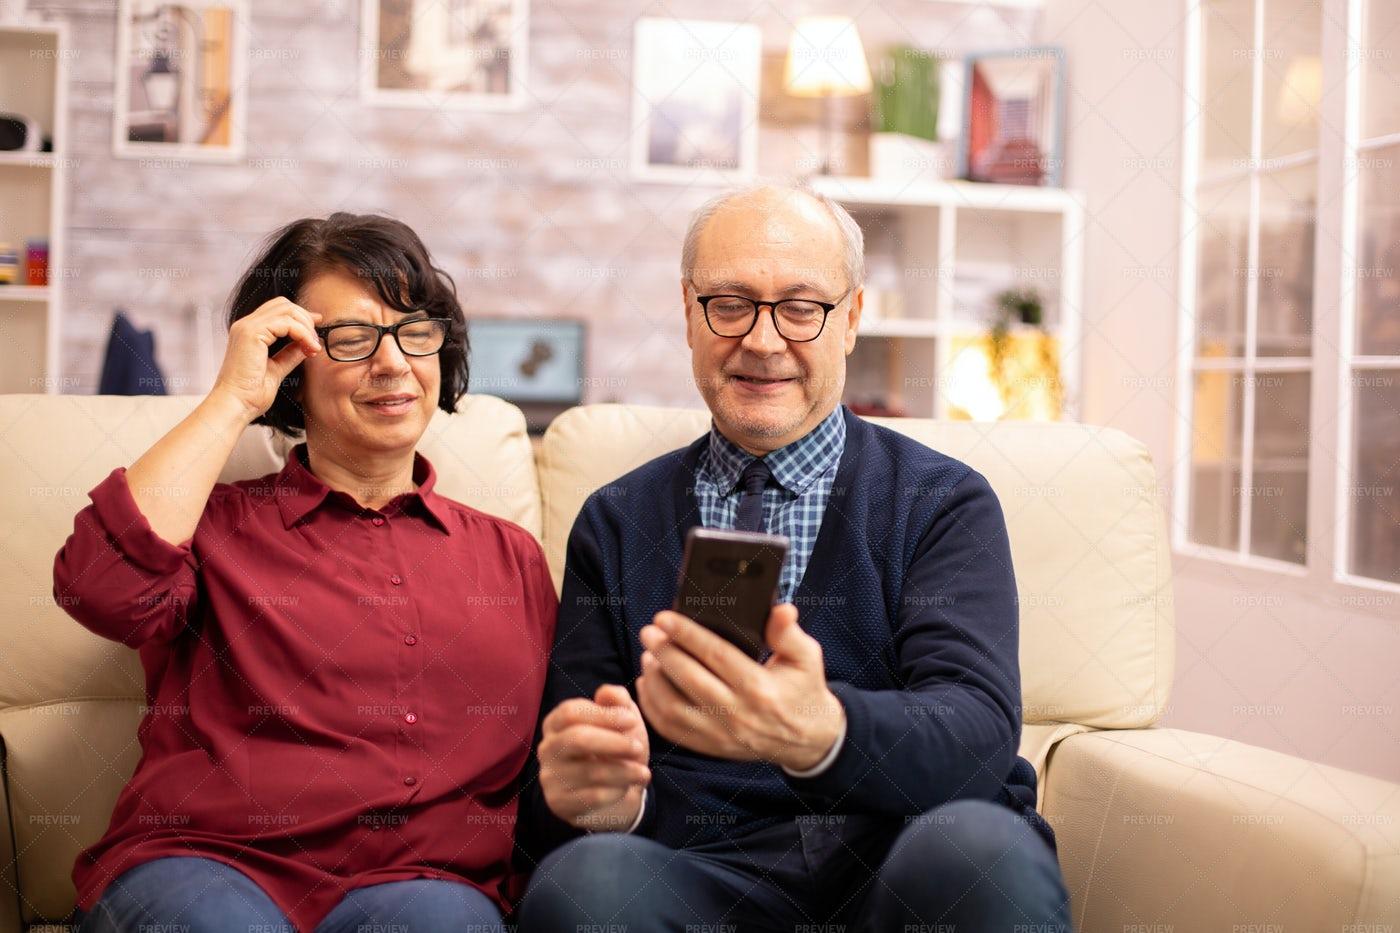 Needing Glasses To See  Phone Screen: Stock Photos